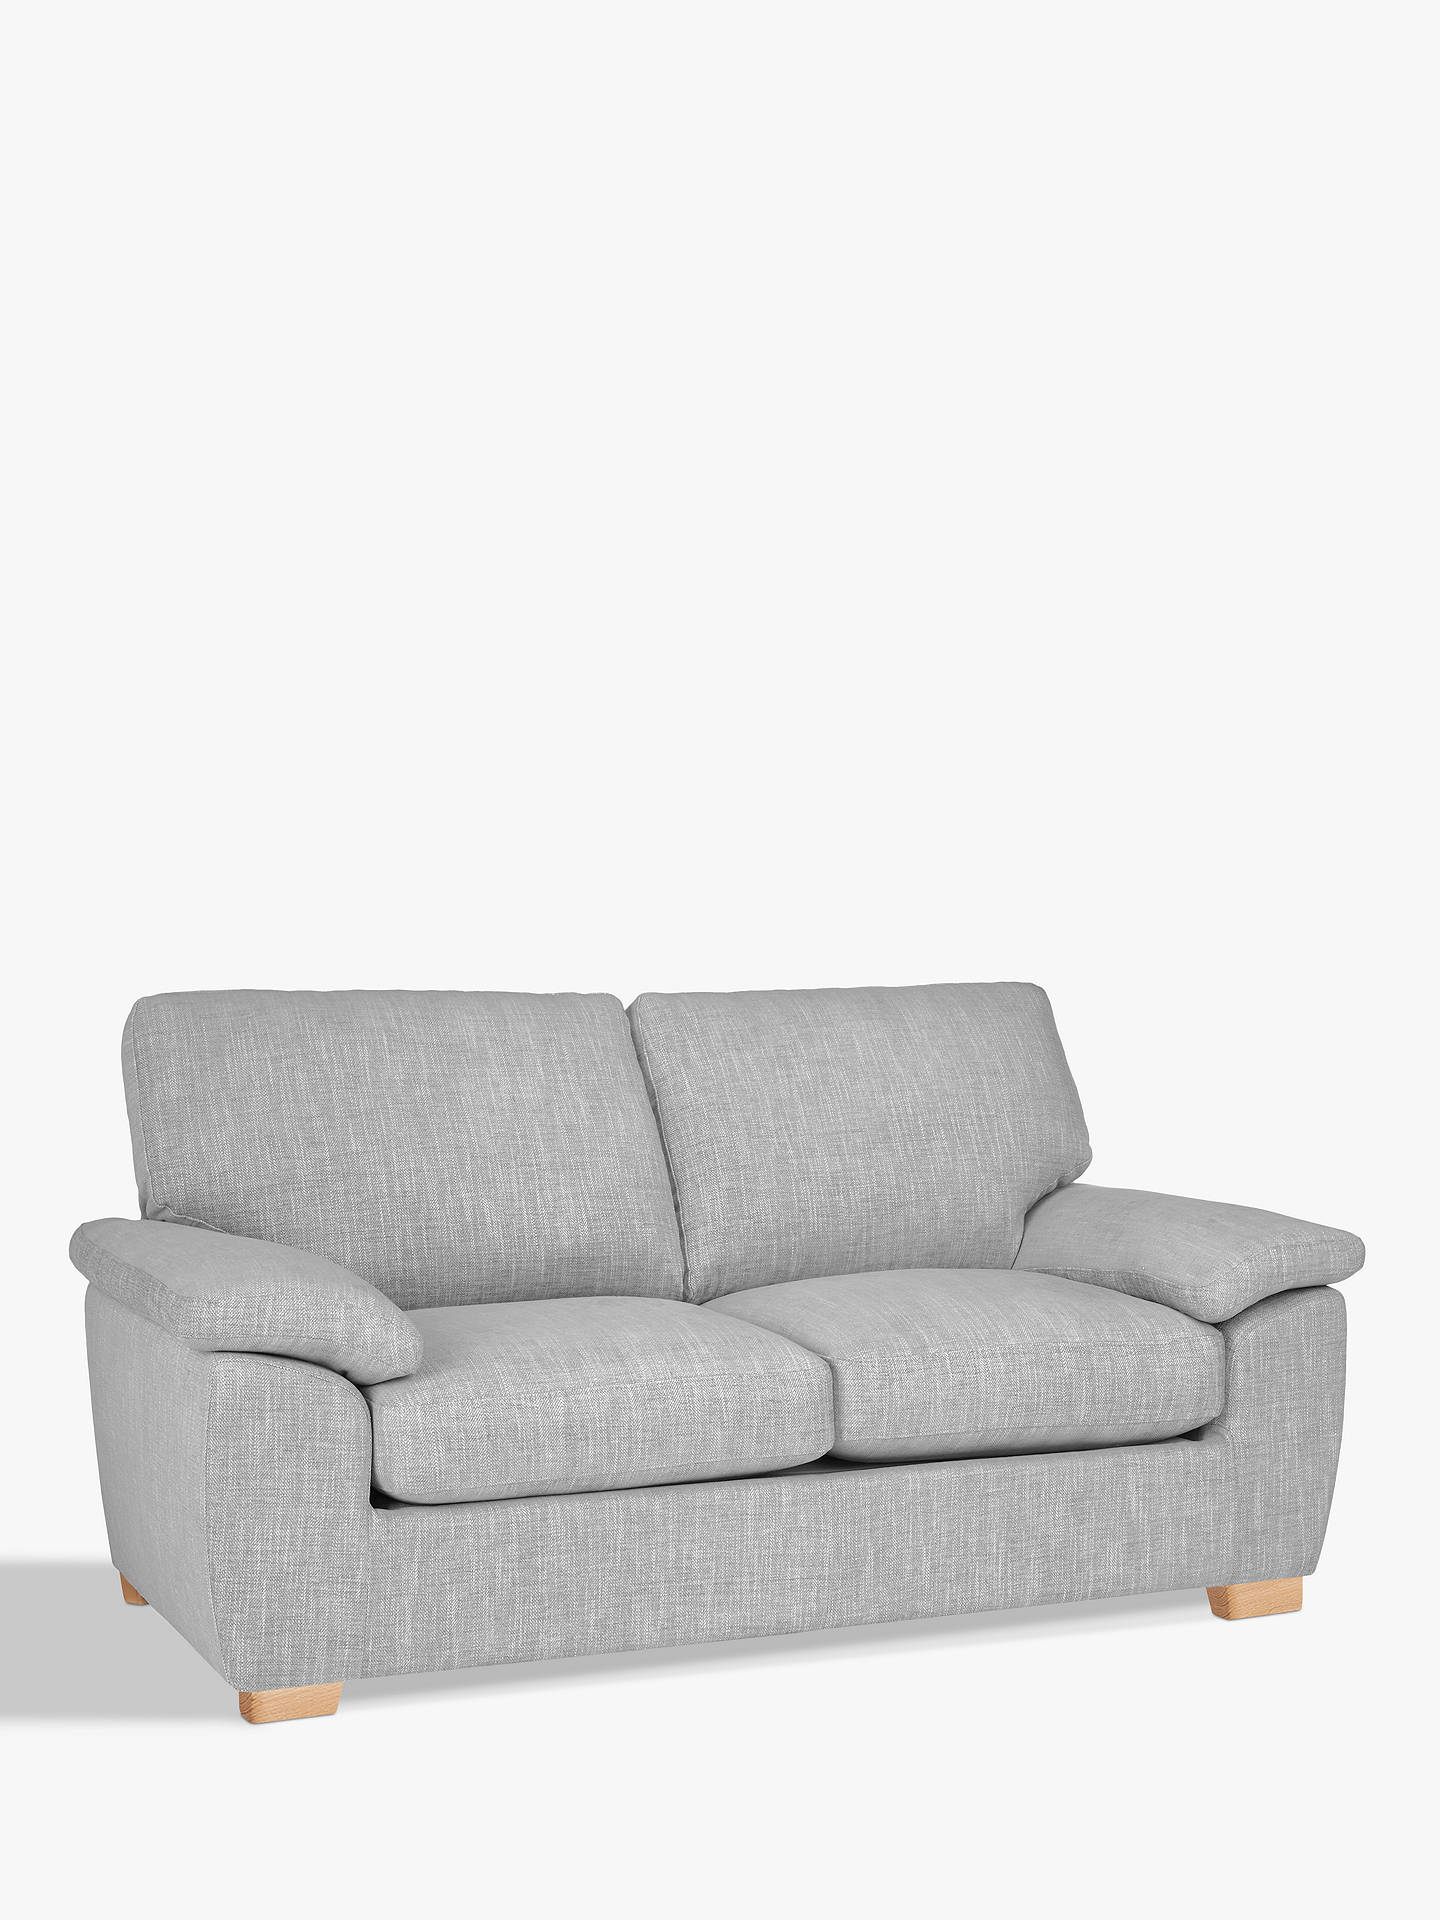 John Lewis Partners Camden Medium 2 Seater Sofa Bed